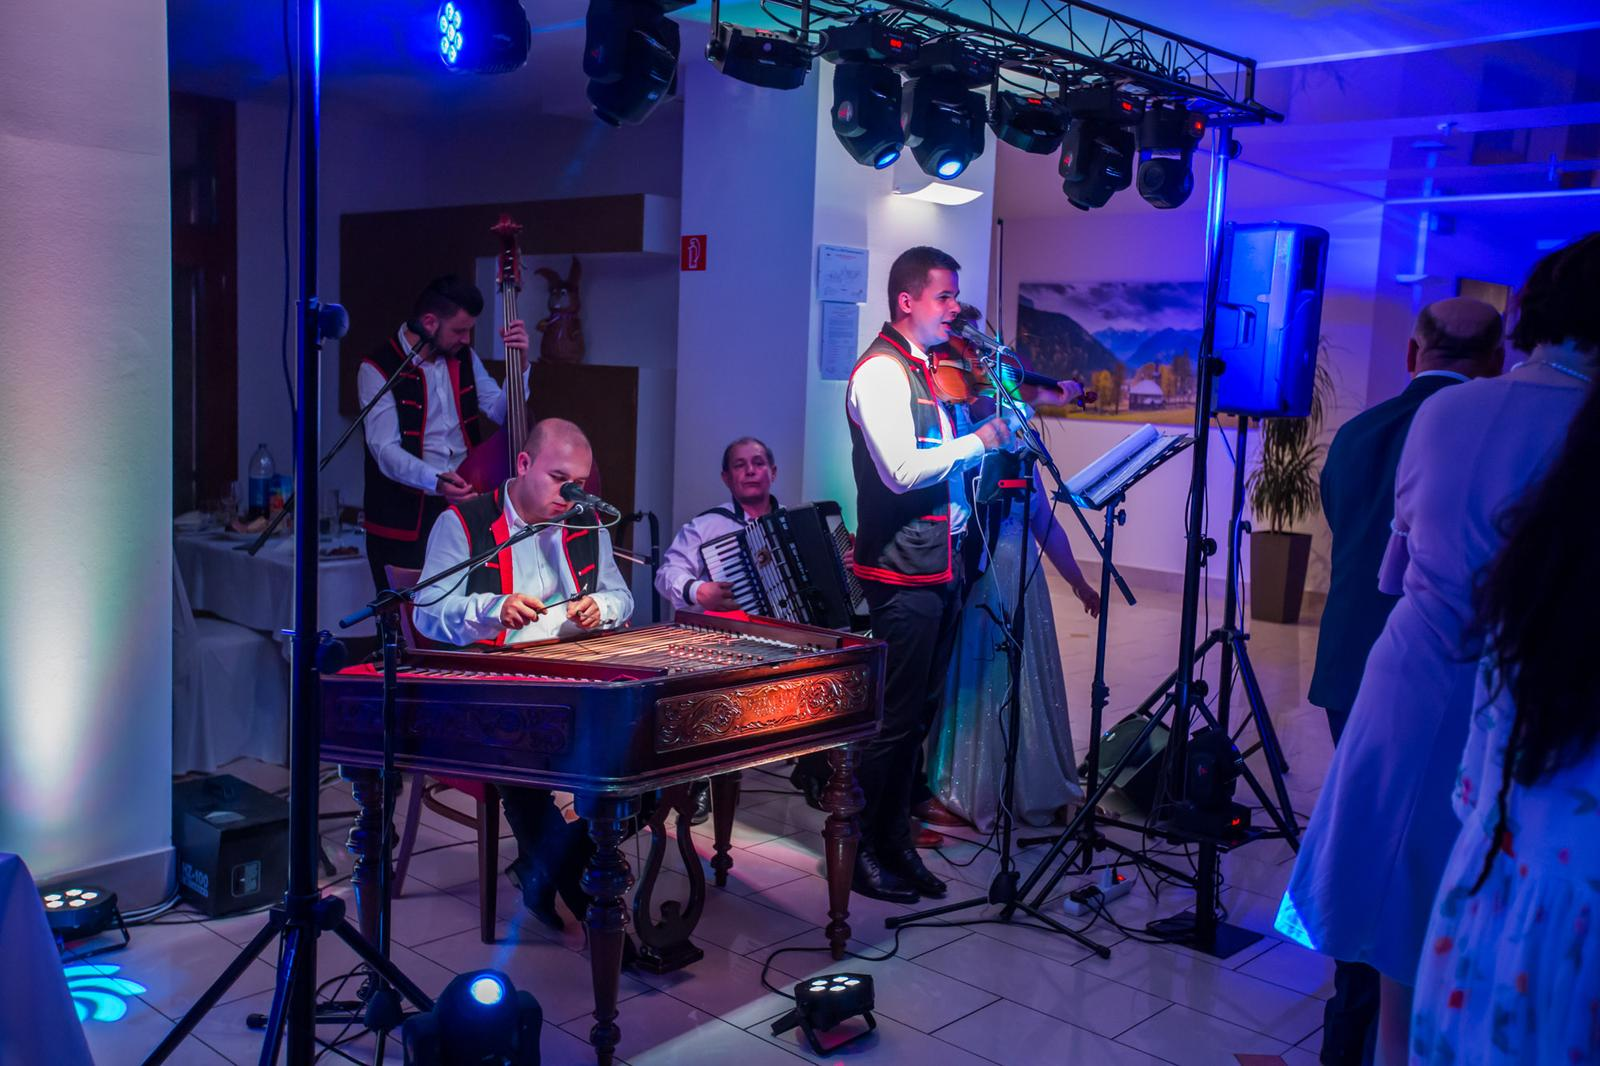 clh_popradcan - Svadba, Tatranská Javorina 2019